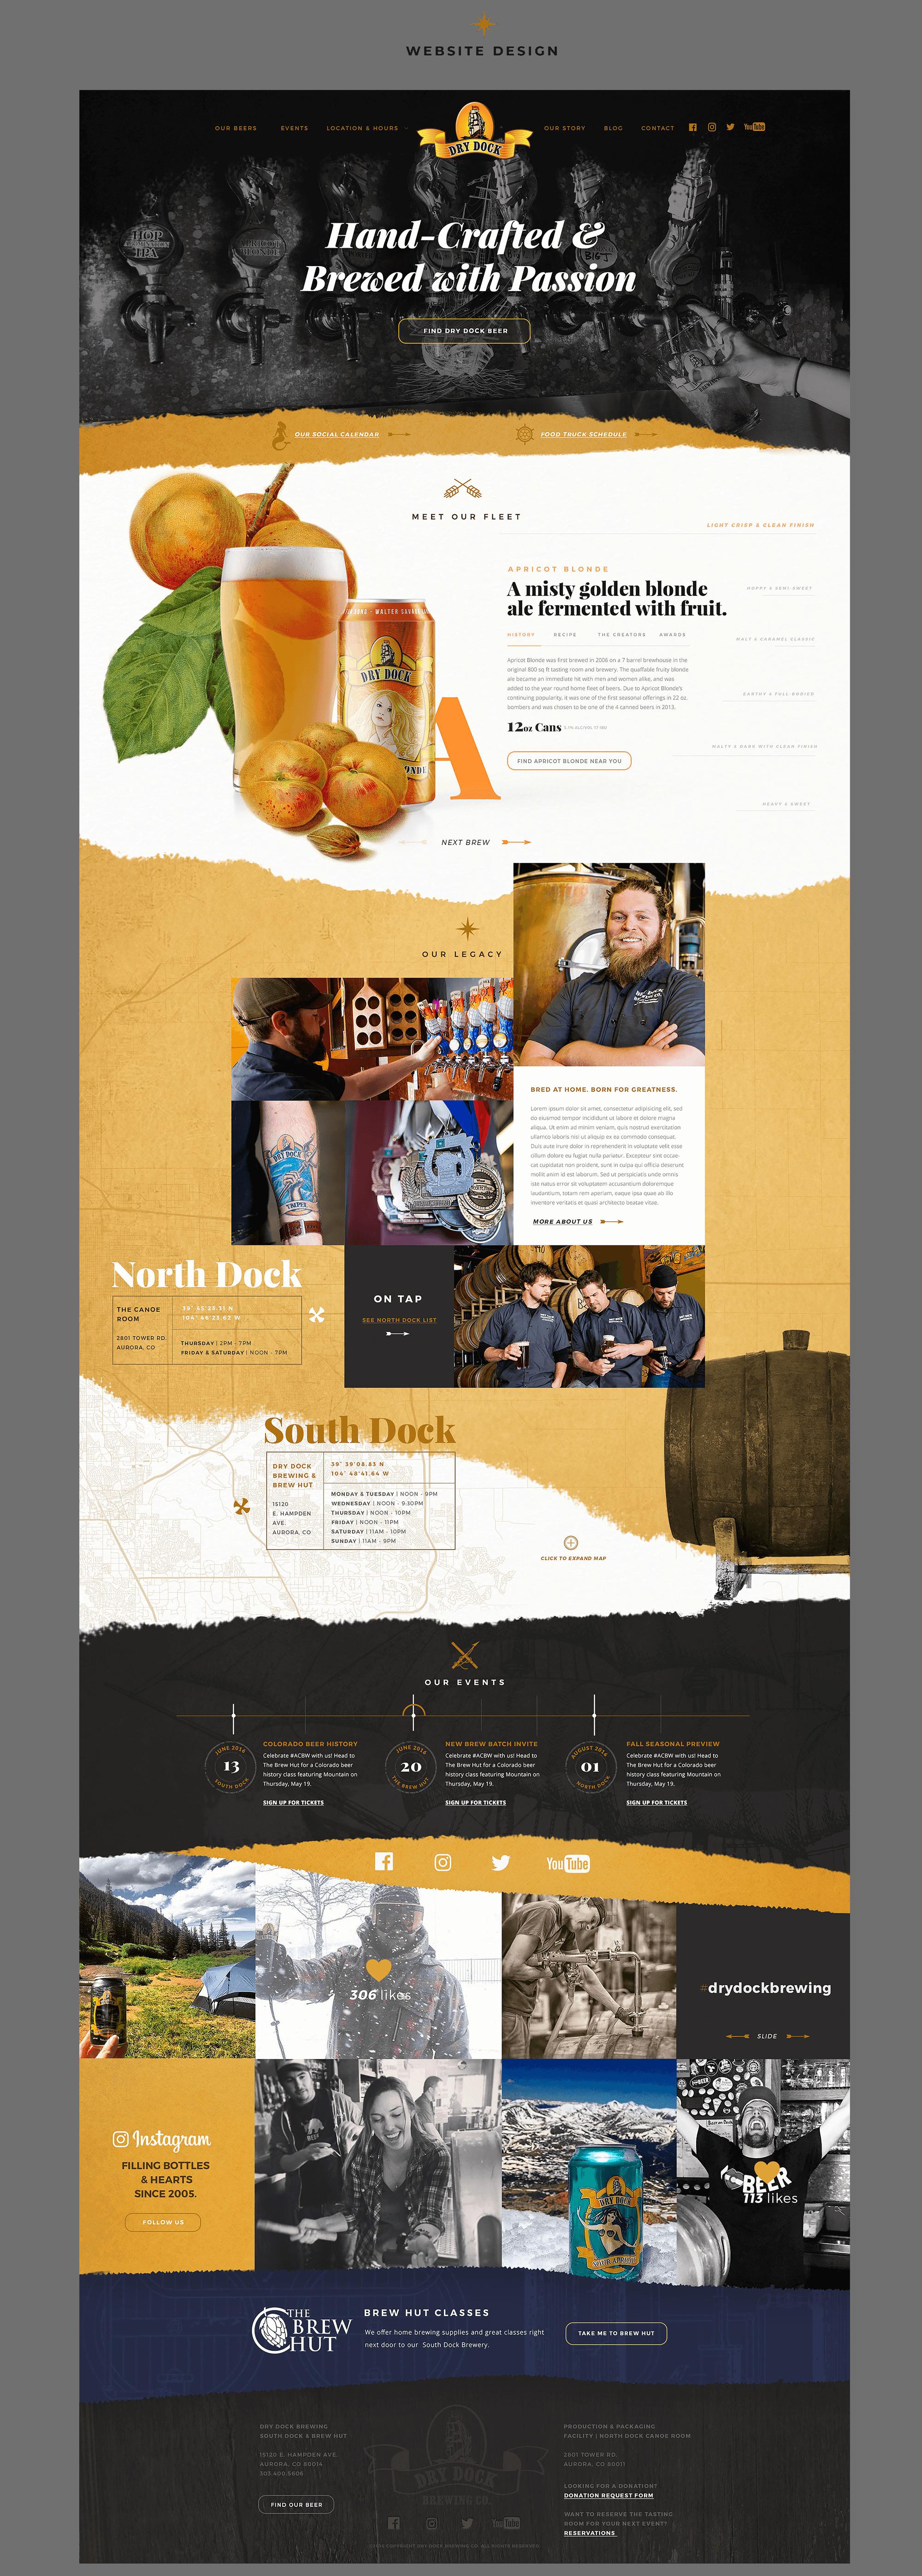 Dry-Dock_Homepage